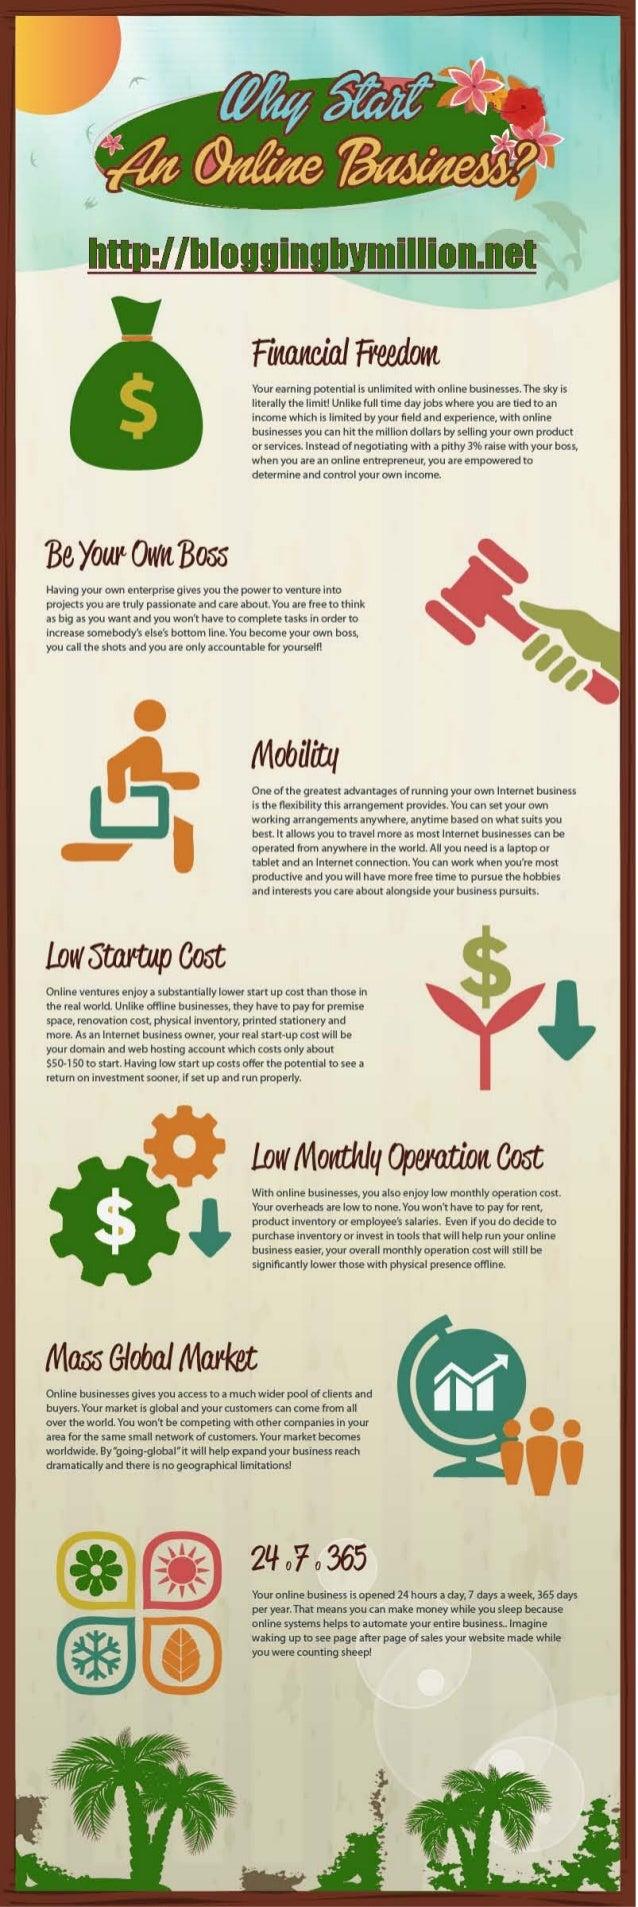 Bloggingbymillion | Why start an online business